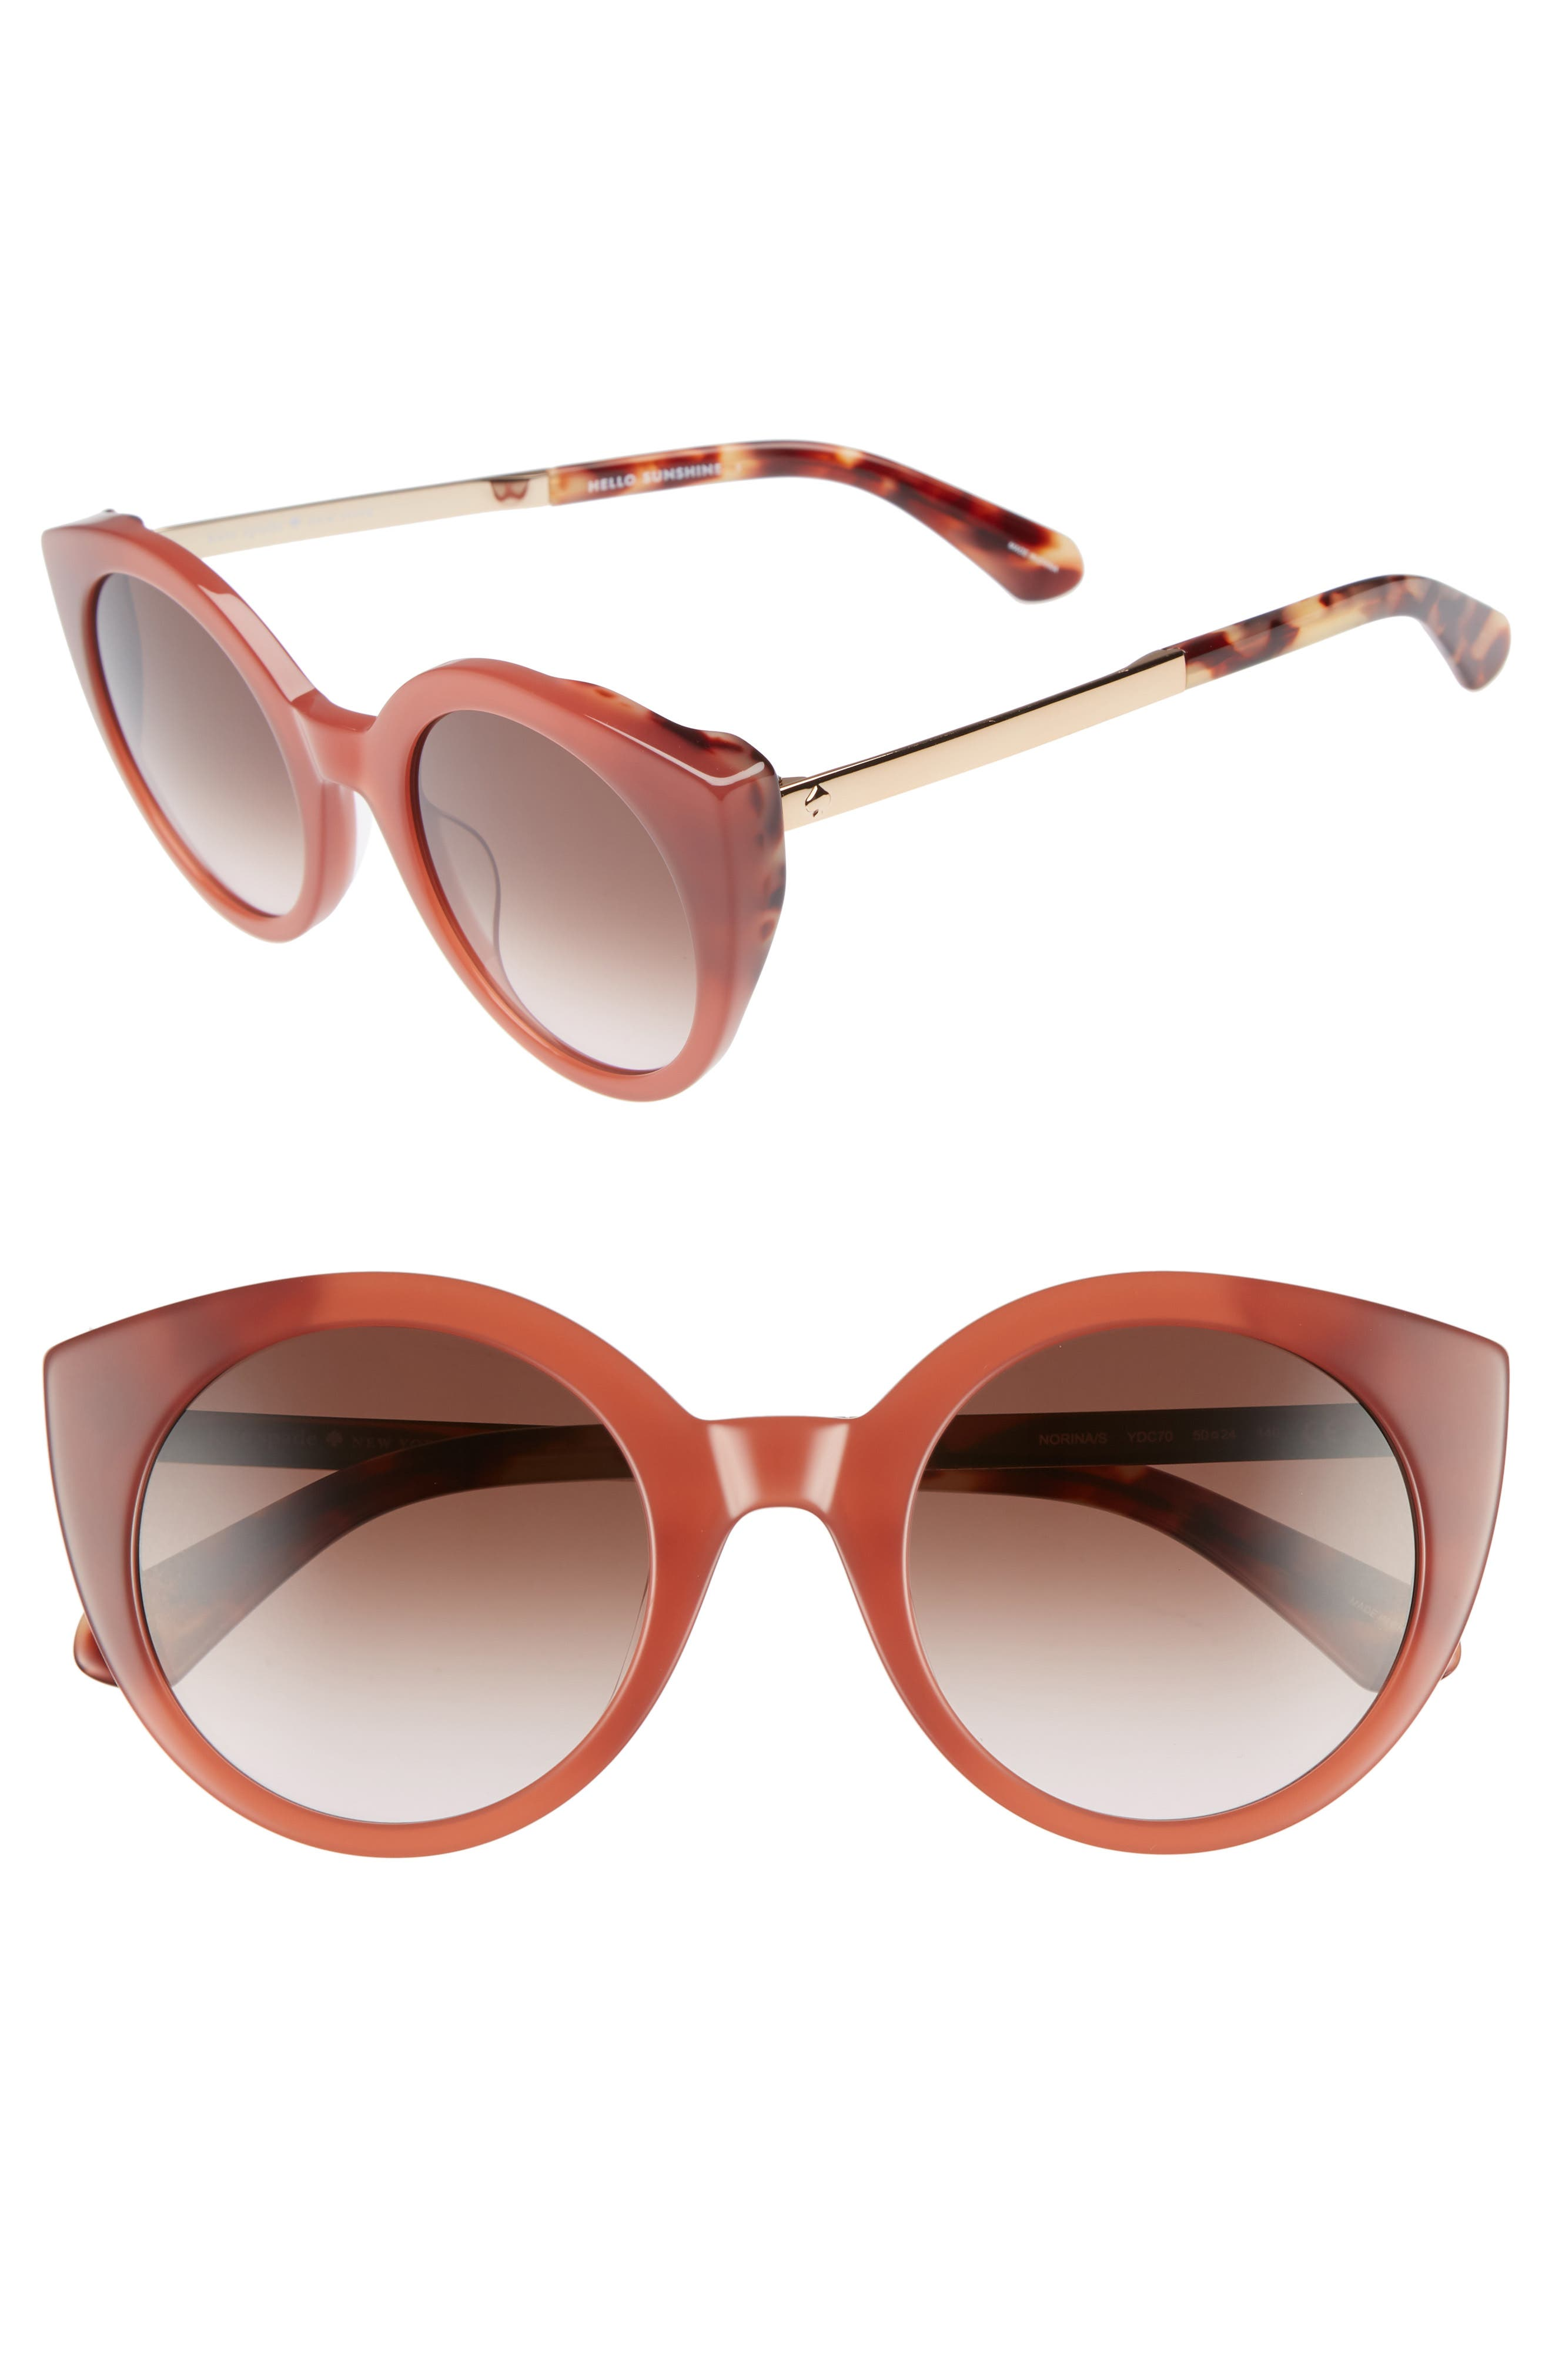 Image of kate spade new york norina 50mm cat eye sunglasses